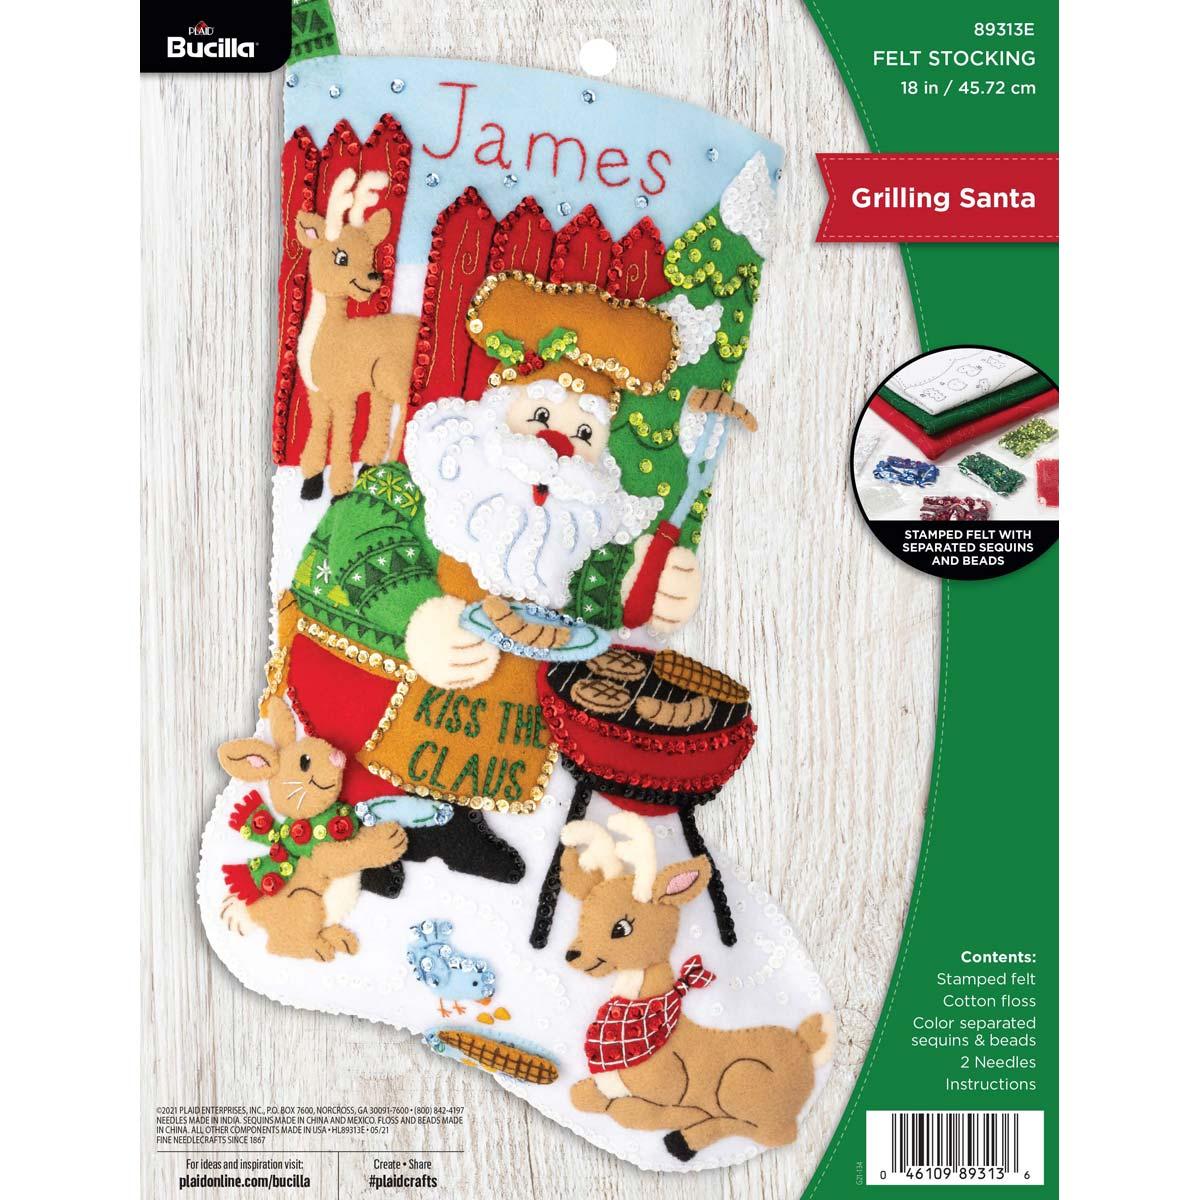 Bucilla ® Seasonal - Felt - Stocking Kits - Grilling Santa - 89313E